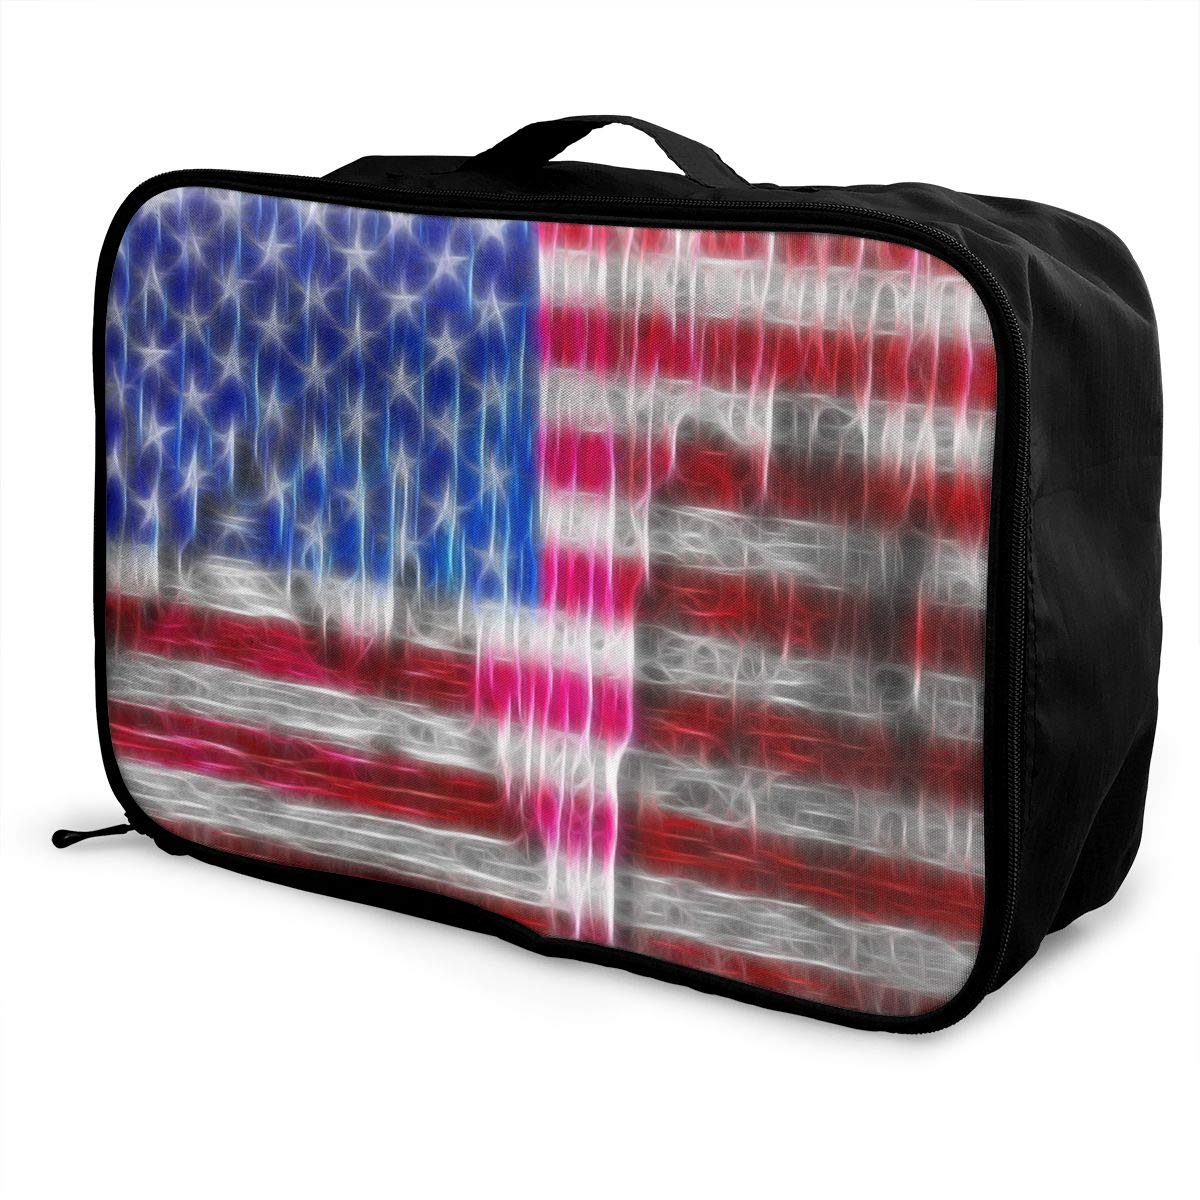 YueLJB Old Glory USA Flag Lightweight Large Capacity Portable Luggage Bag Travel Duffel Bag Storage Carry Luggage Duffle Tote Bag